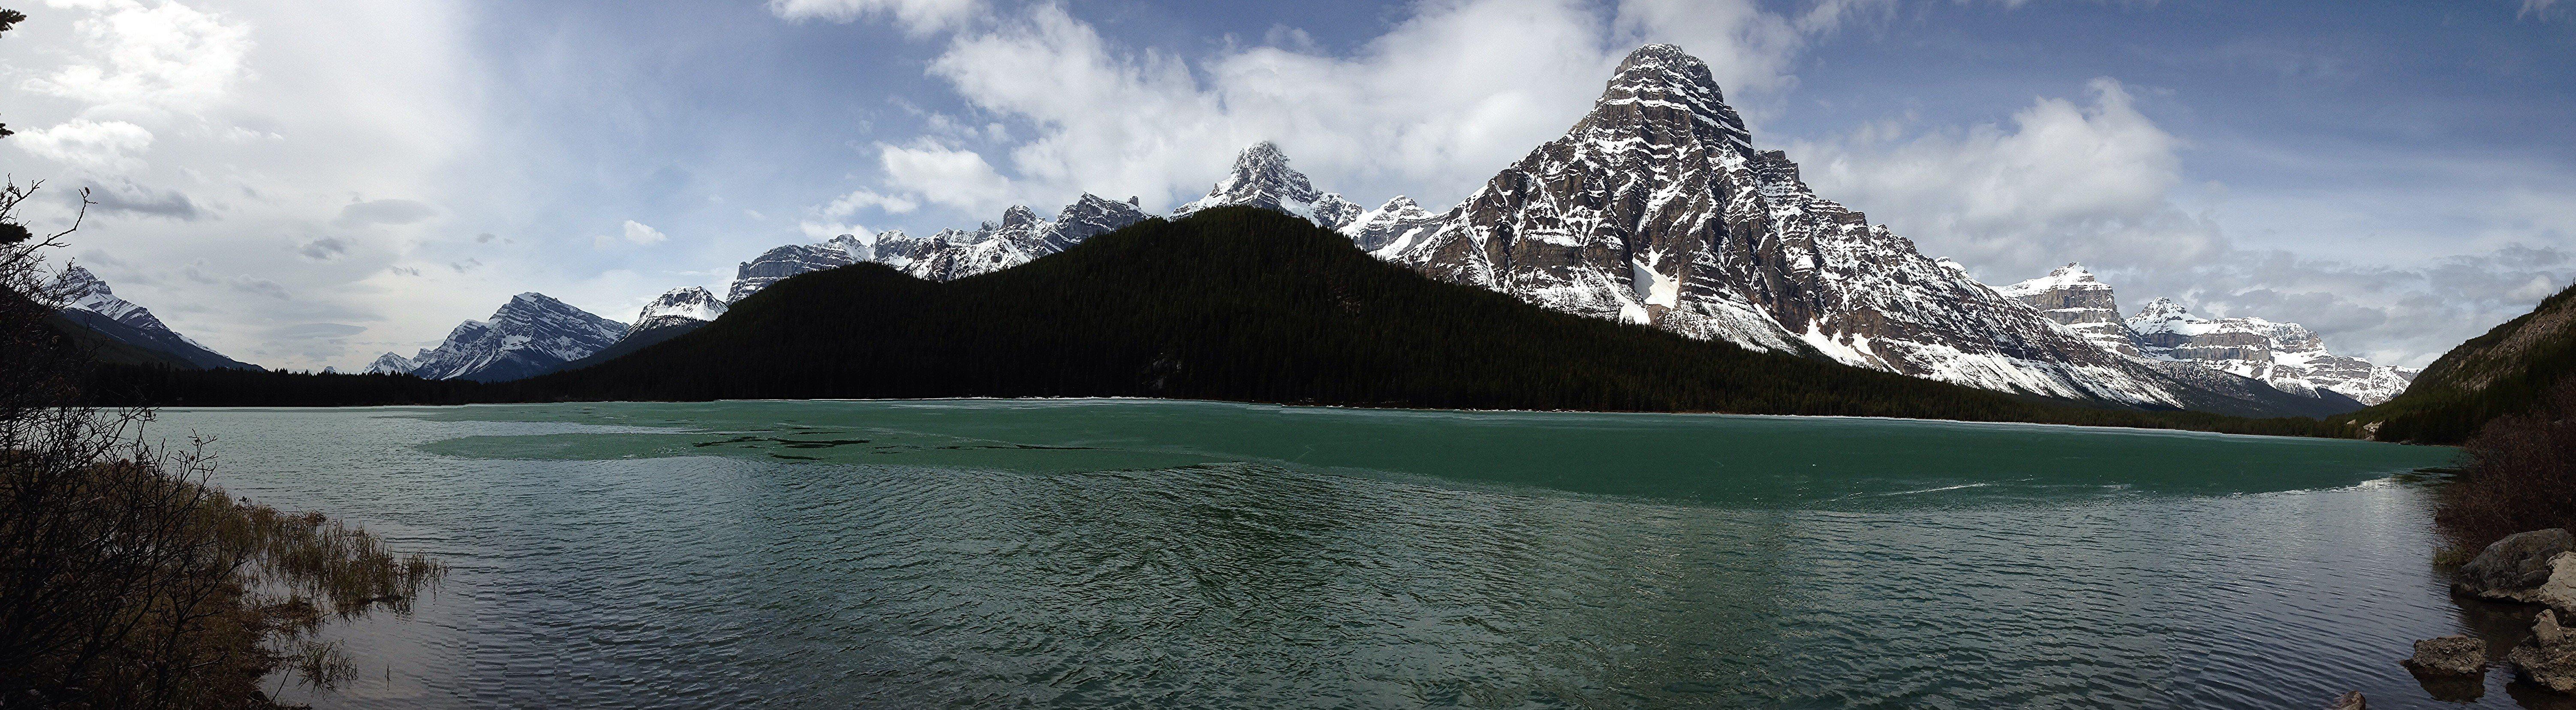 Banff National Park en Alberta.